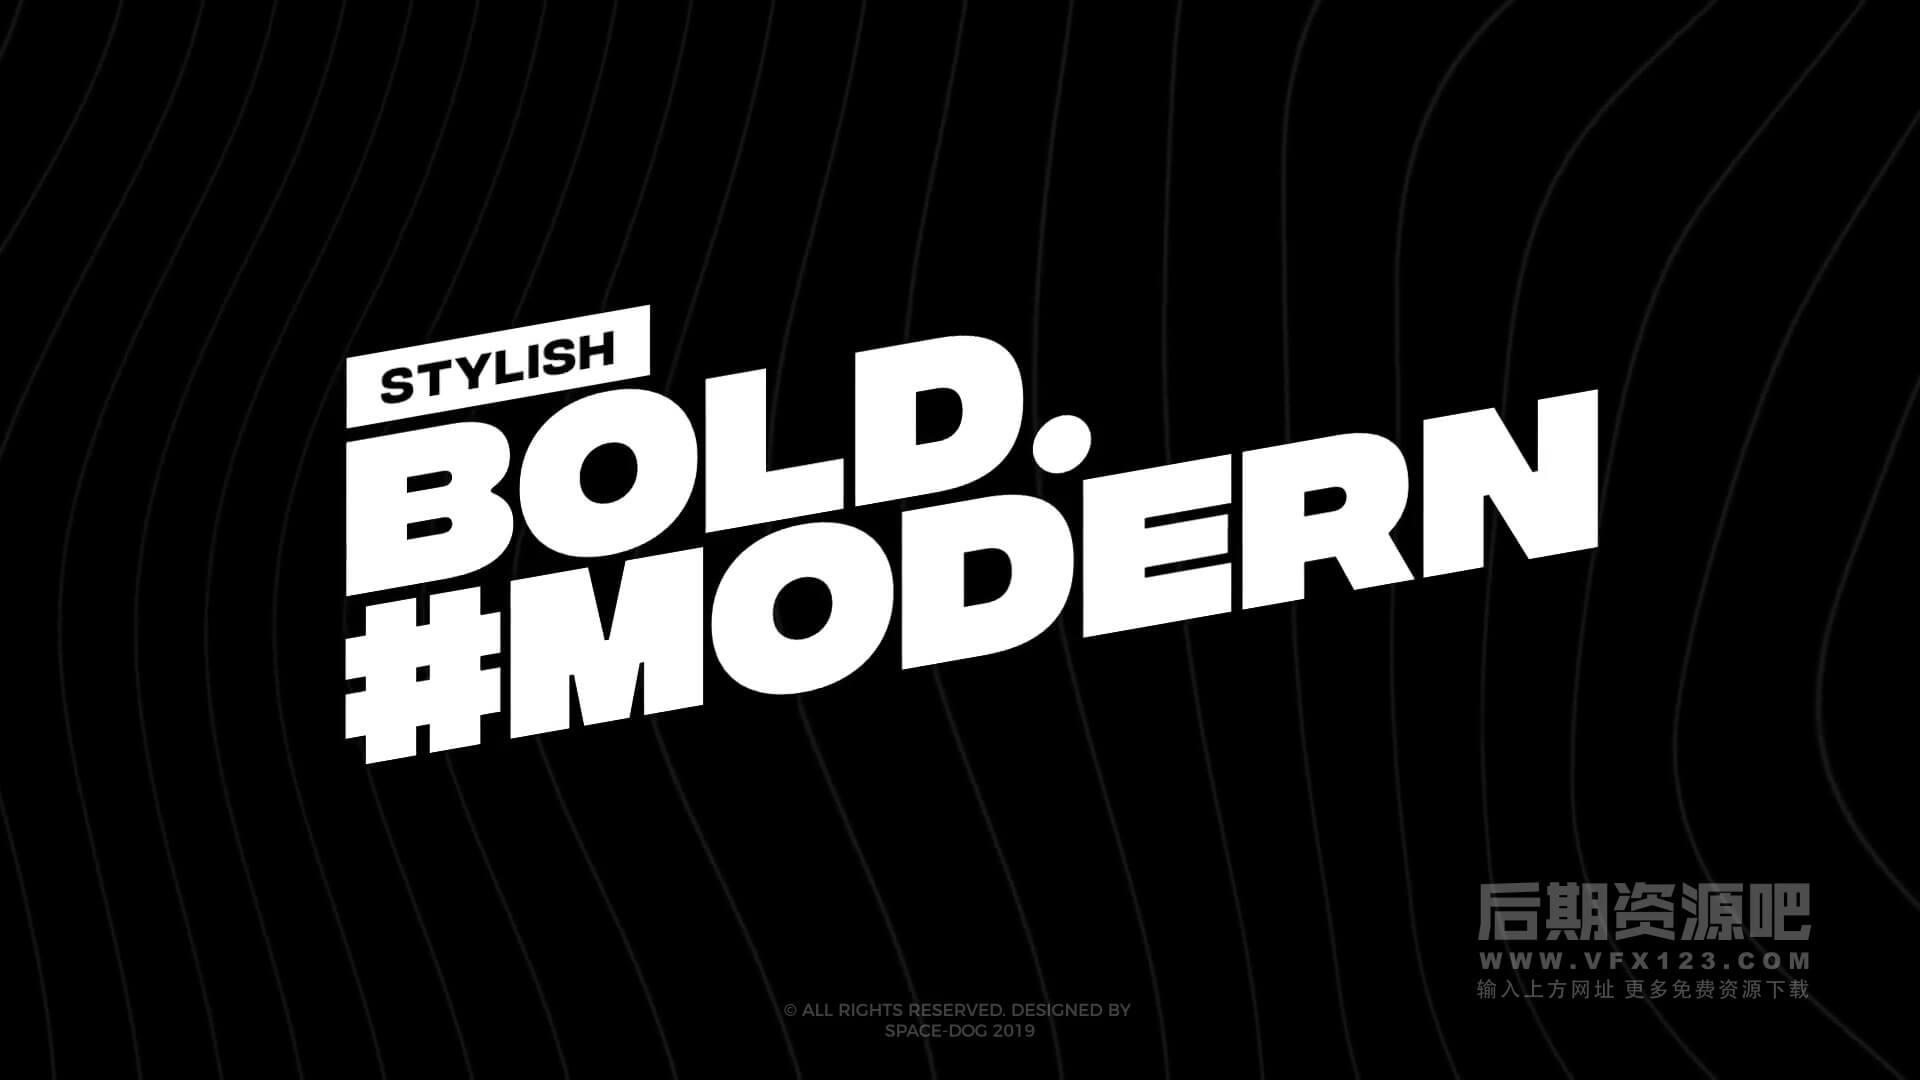 fcpx标题插件 25组现代时尚大文字排版动画预设 Modern Big Titles